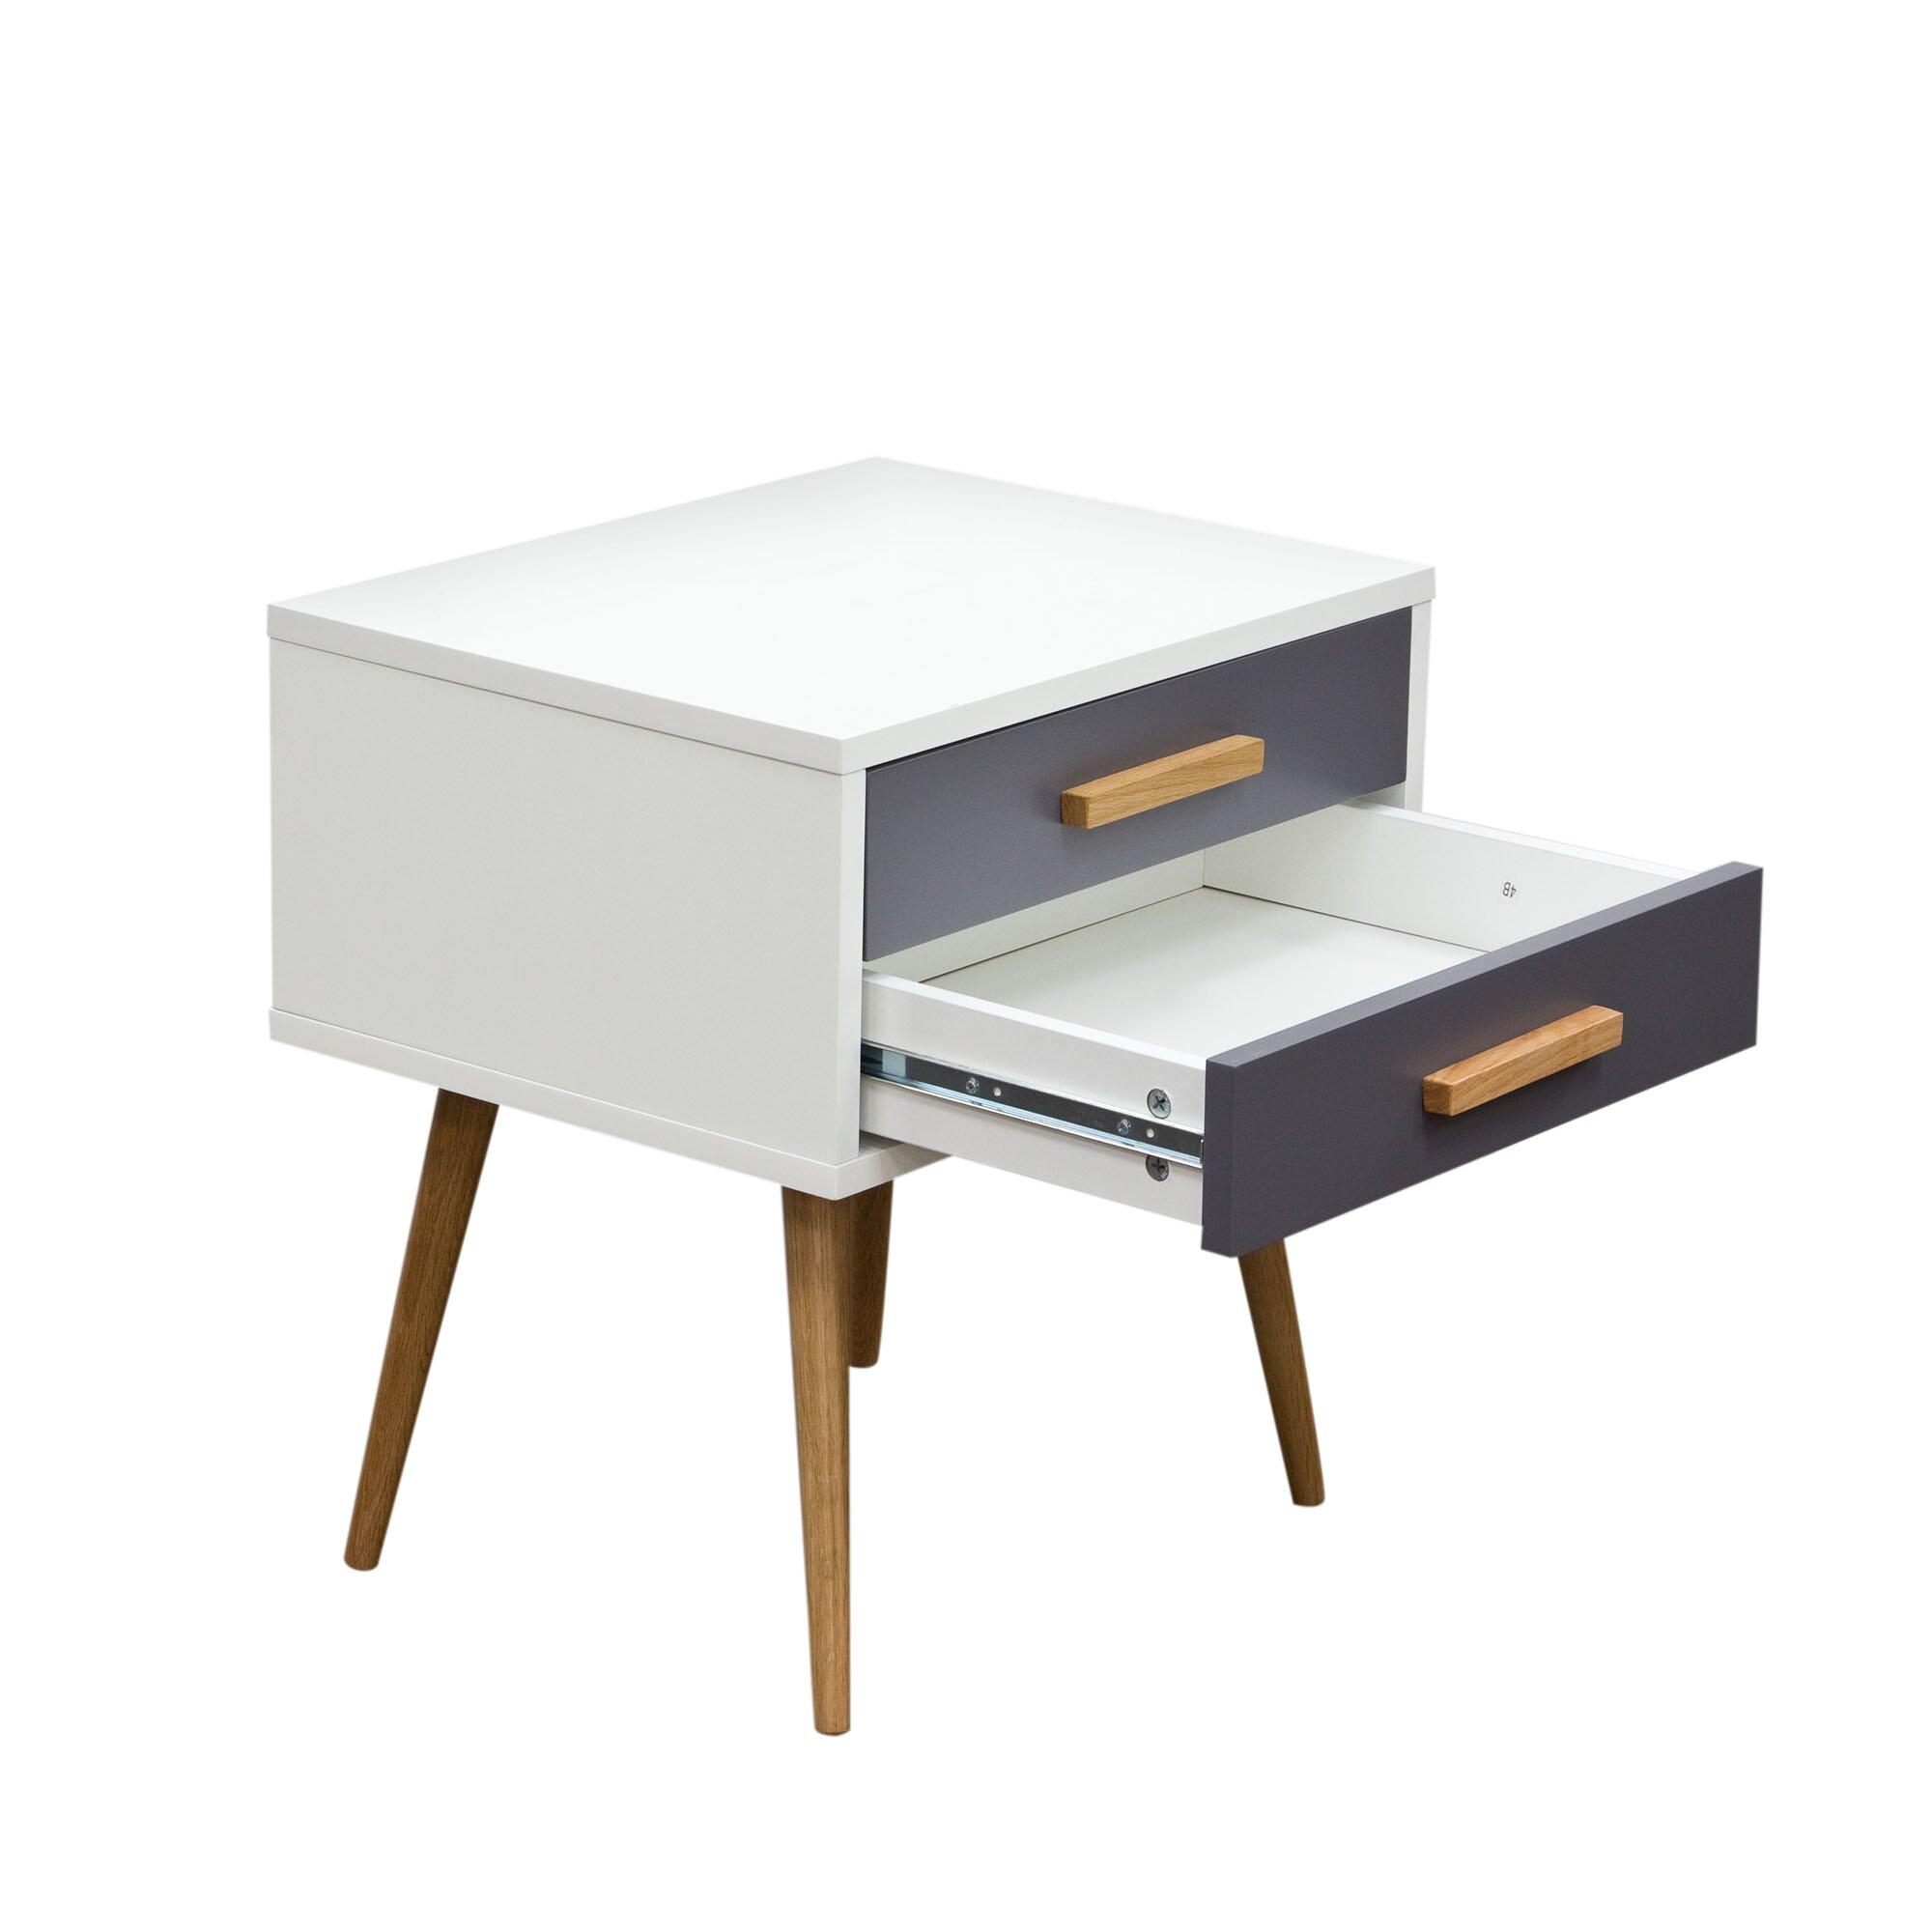 Diamond sofa tangent end table reviews wayfair for Sofa end tables